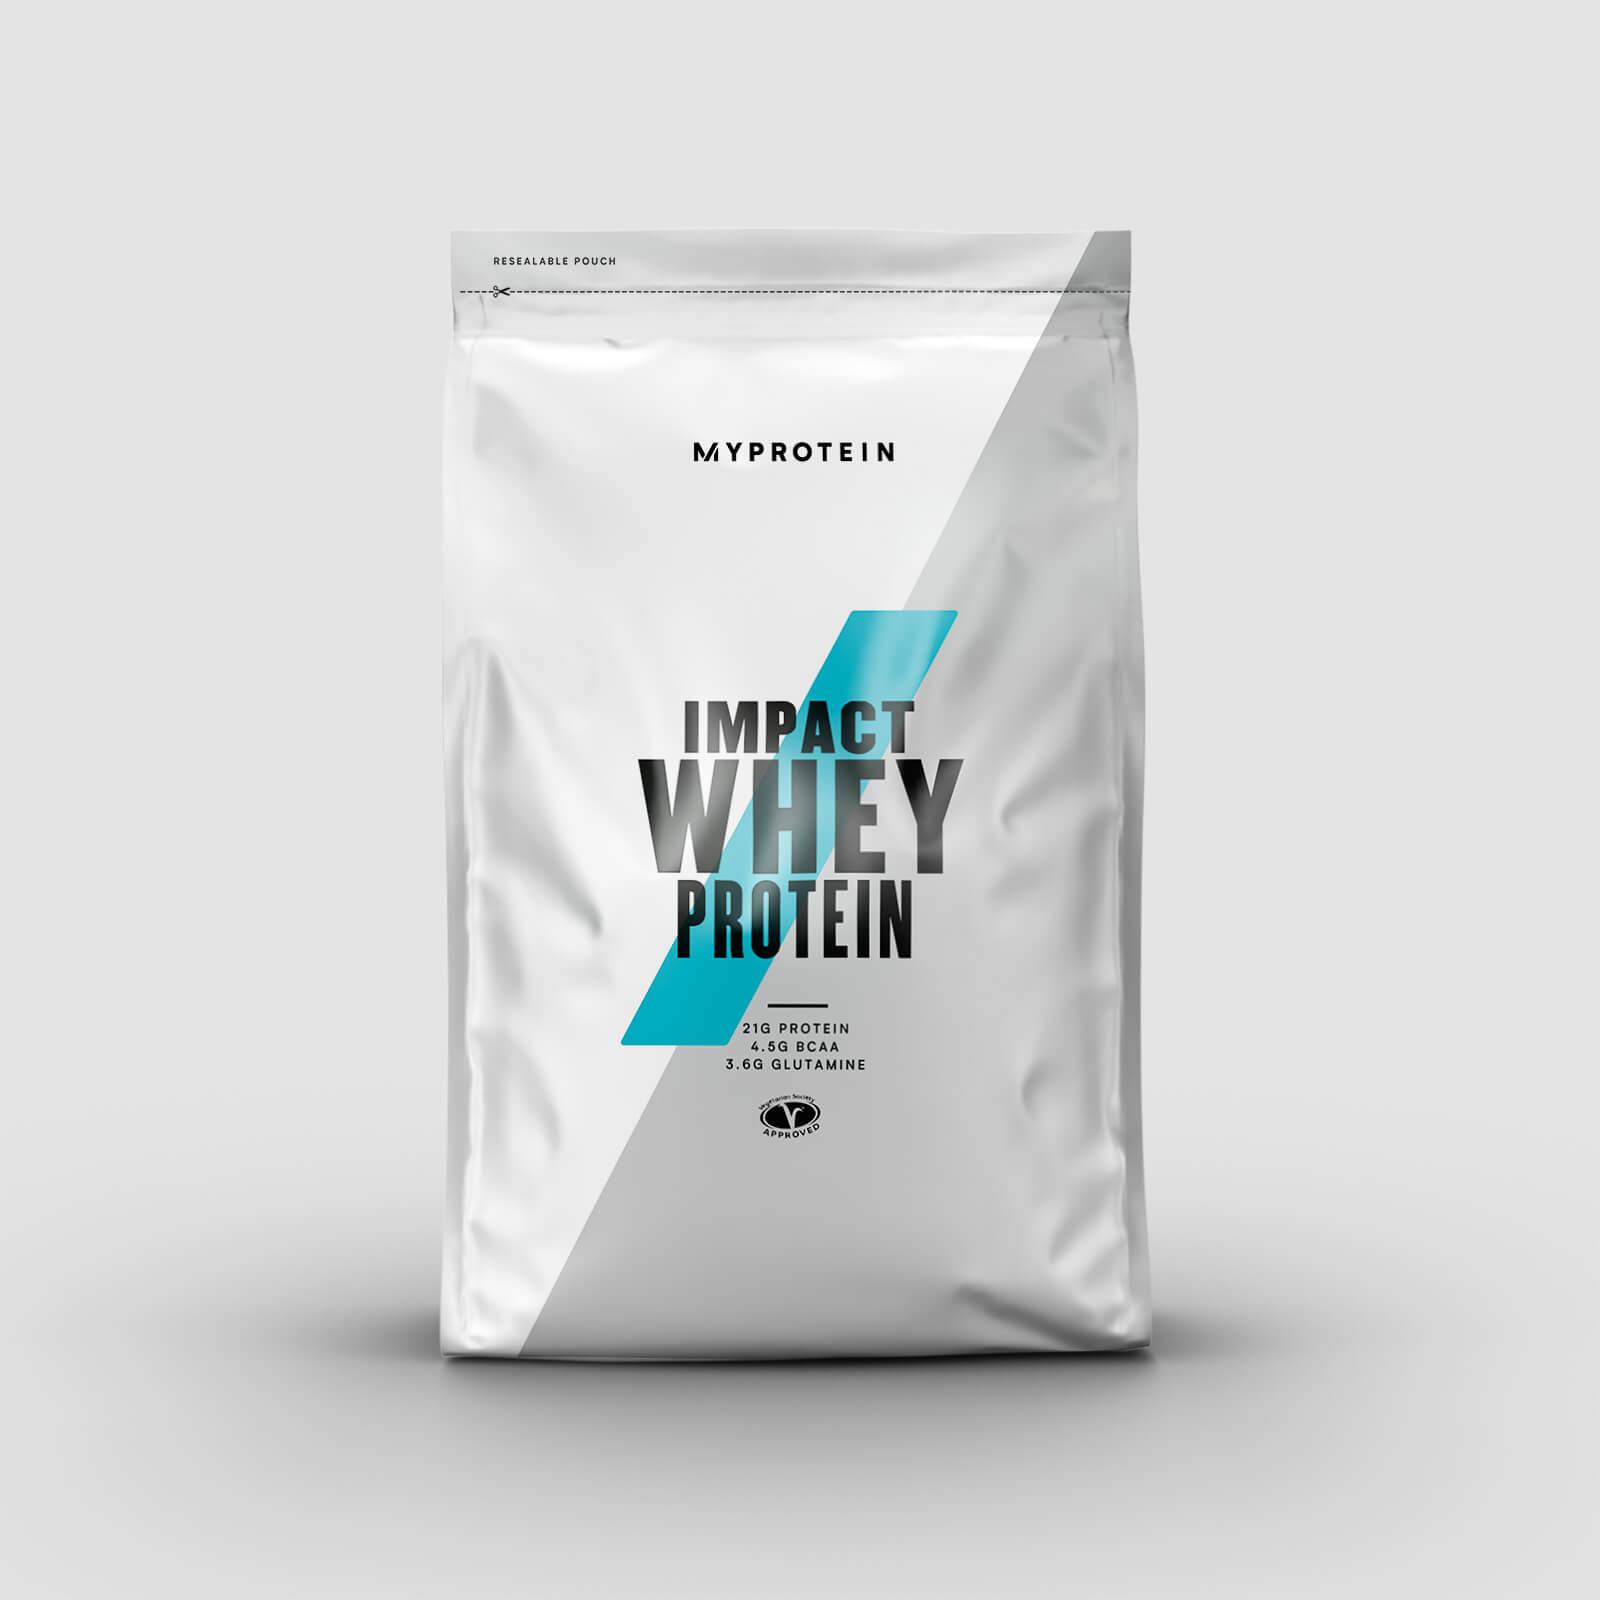 Myprotein Impact Whey Protein - 1kg - Vanilla Stevia